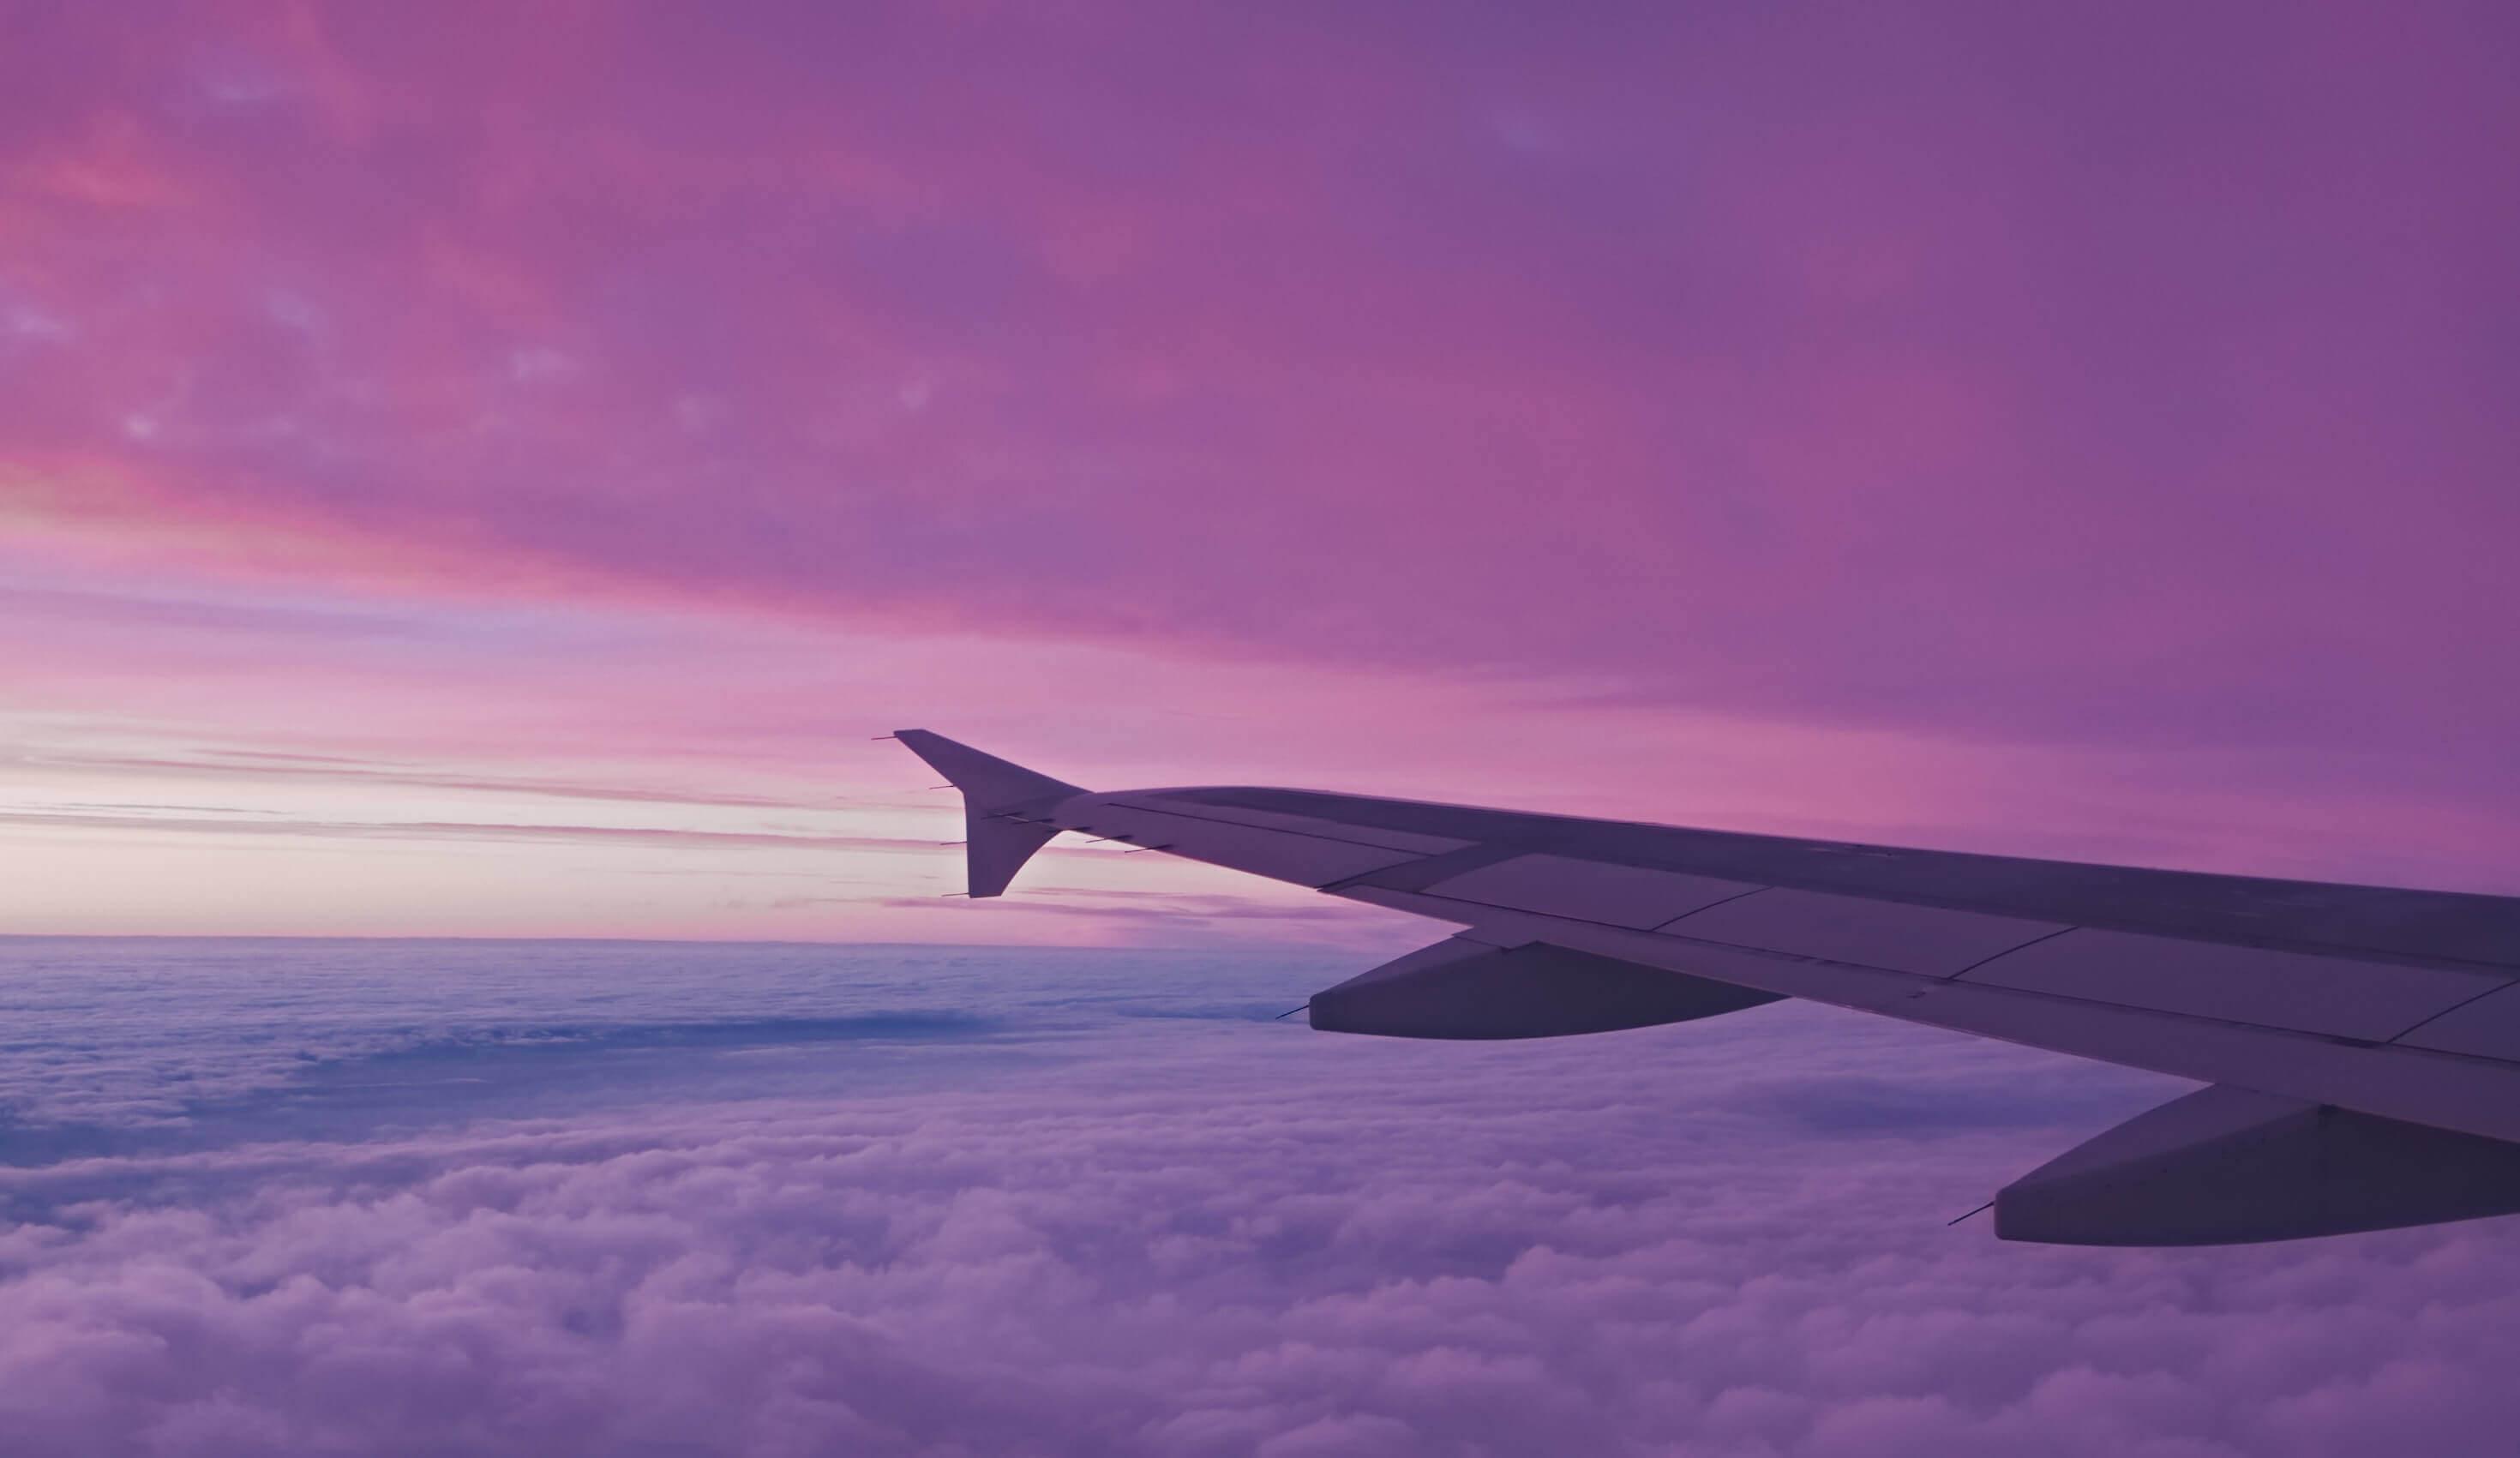 Поясним за новости: куда пропали билеты «Аэрофлота» на Дальний Восток